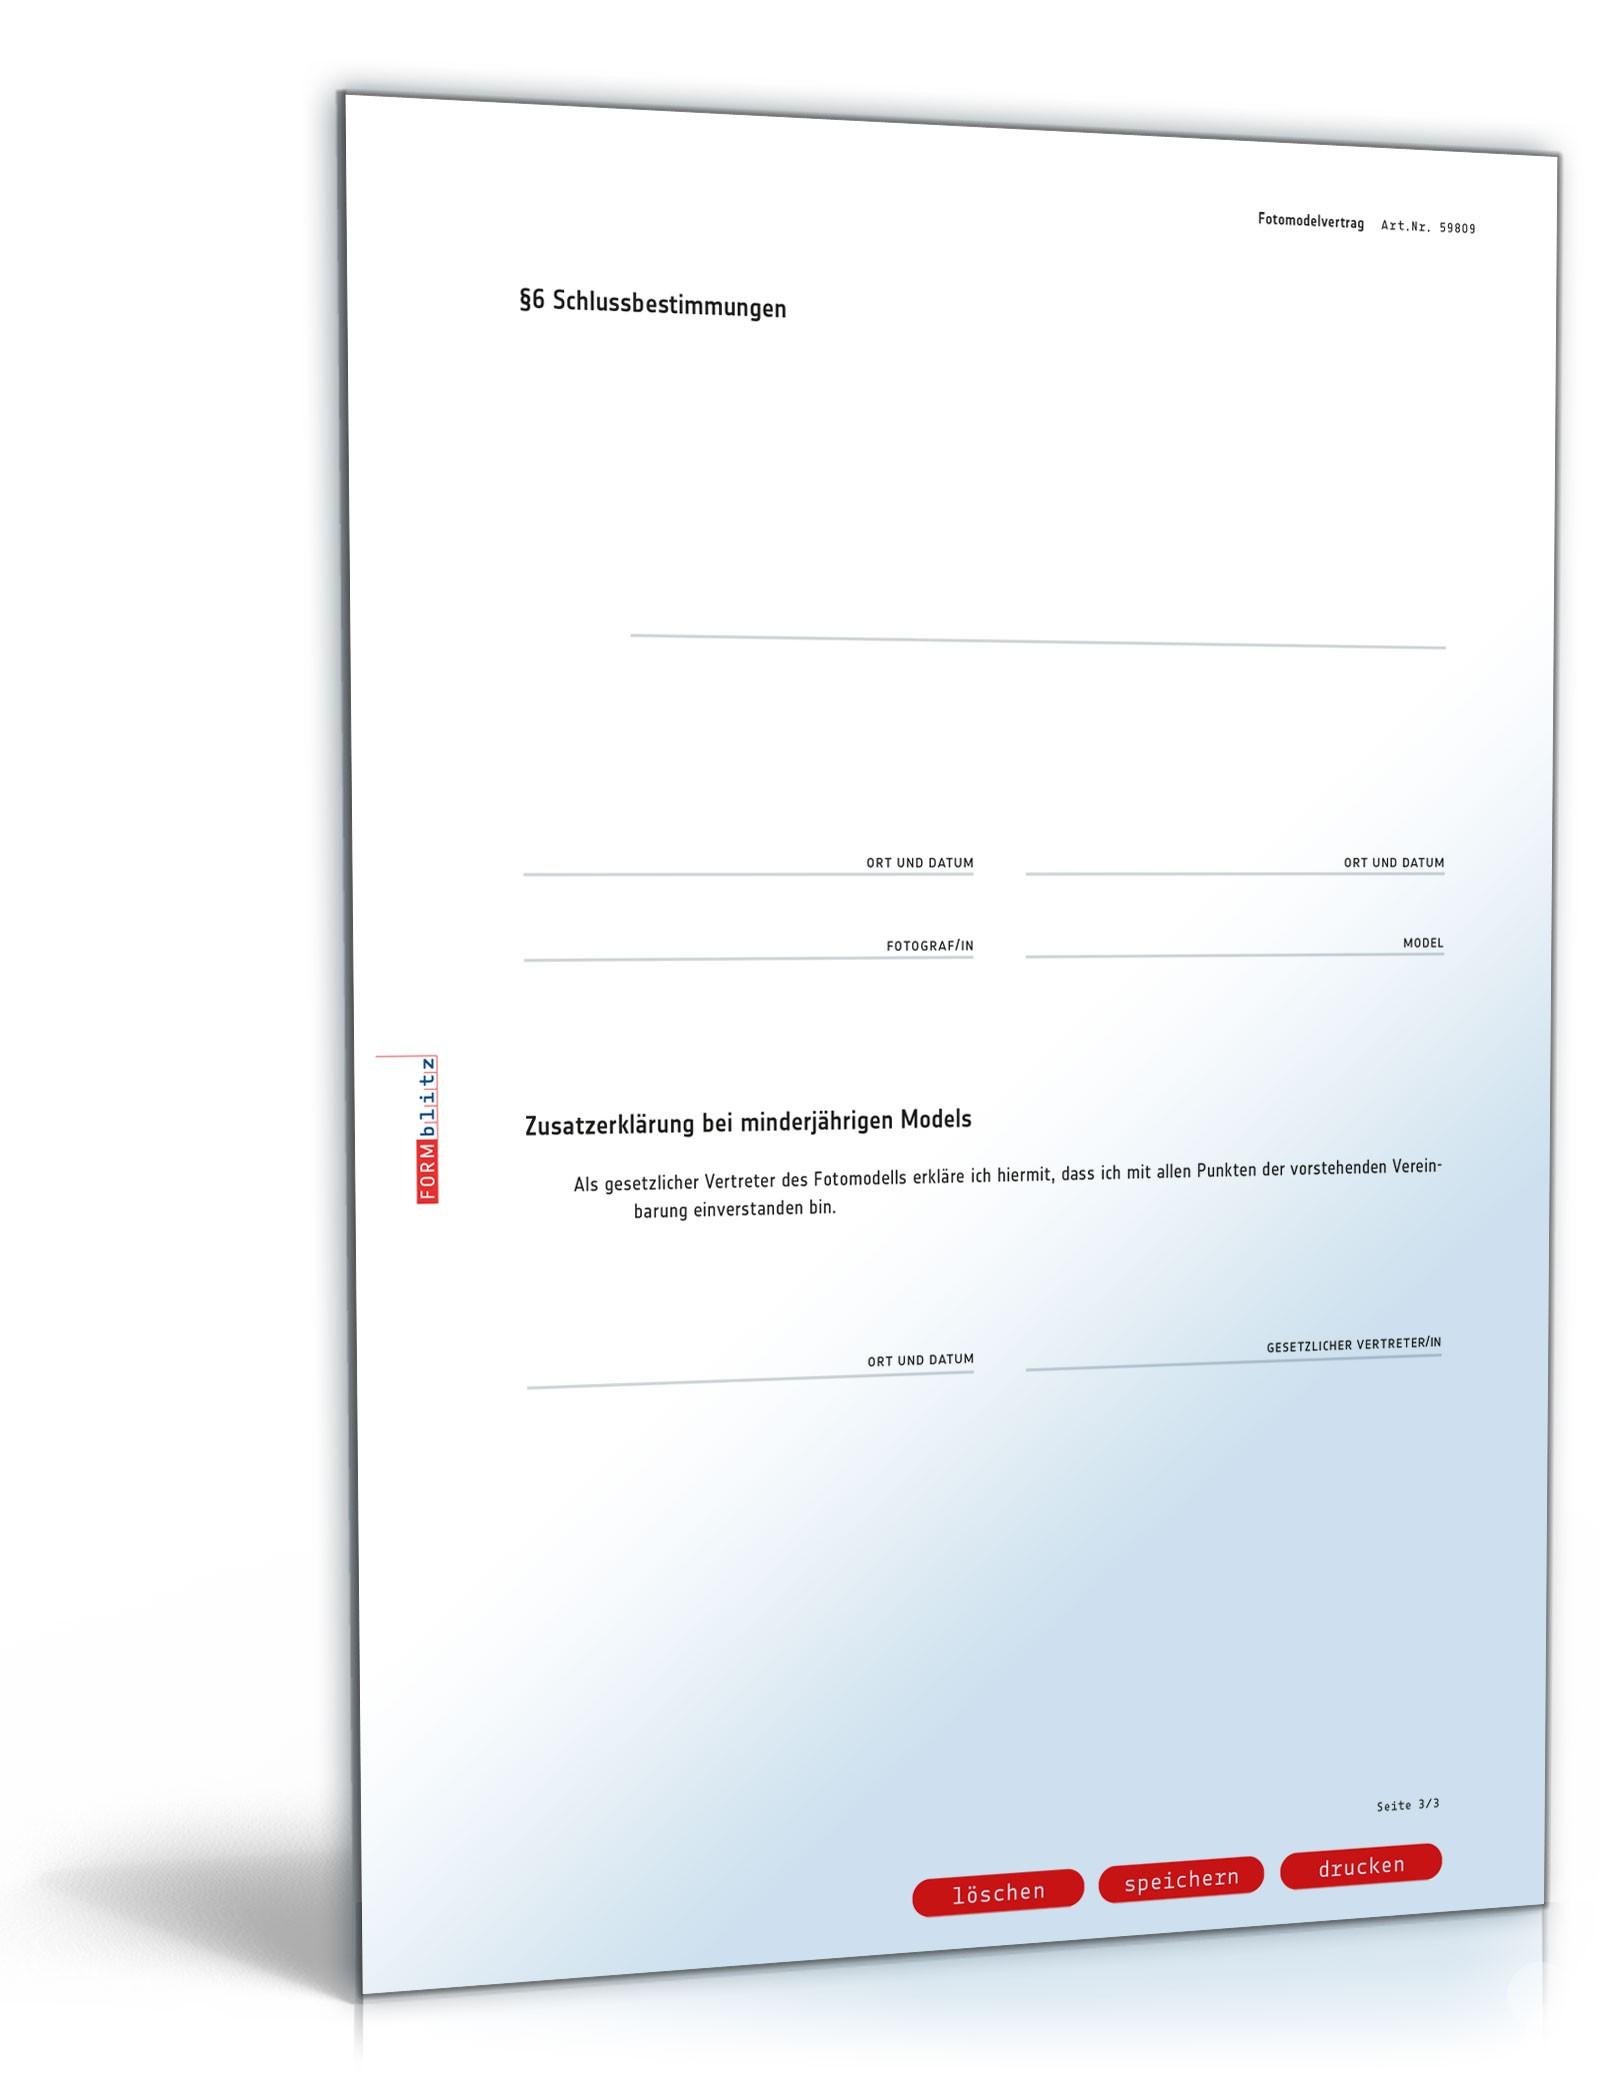 fotomodelvertrag pdf seite 03 - Tfp Vertrag Muster